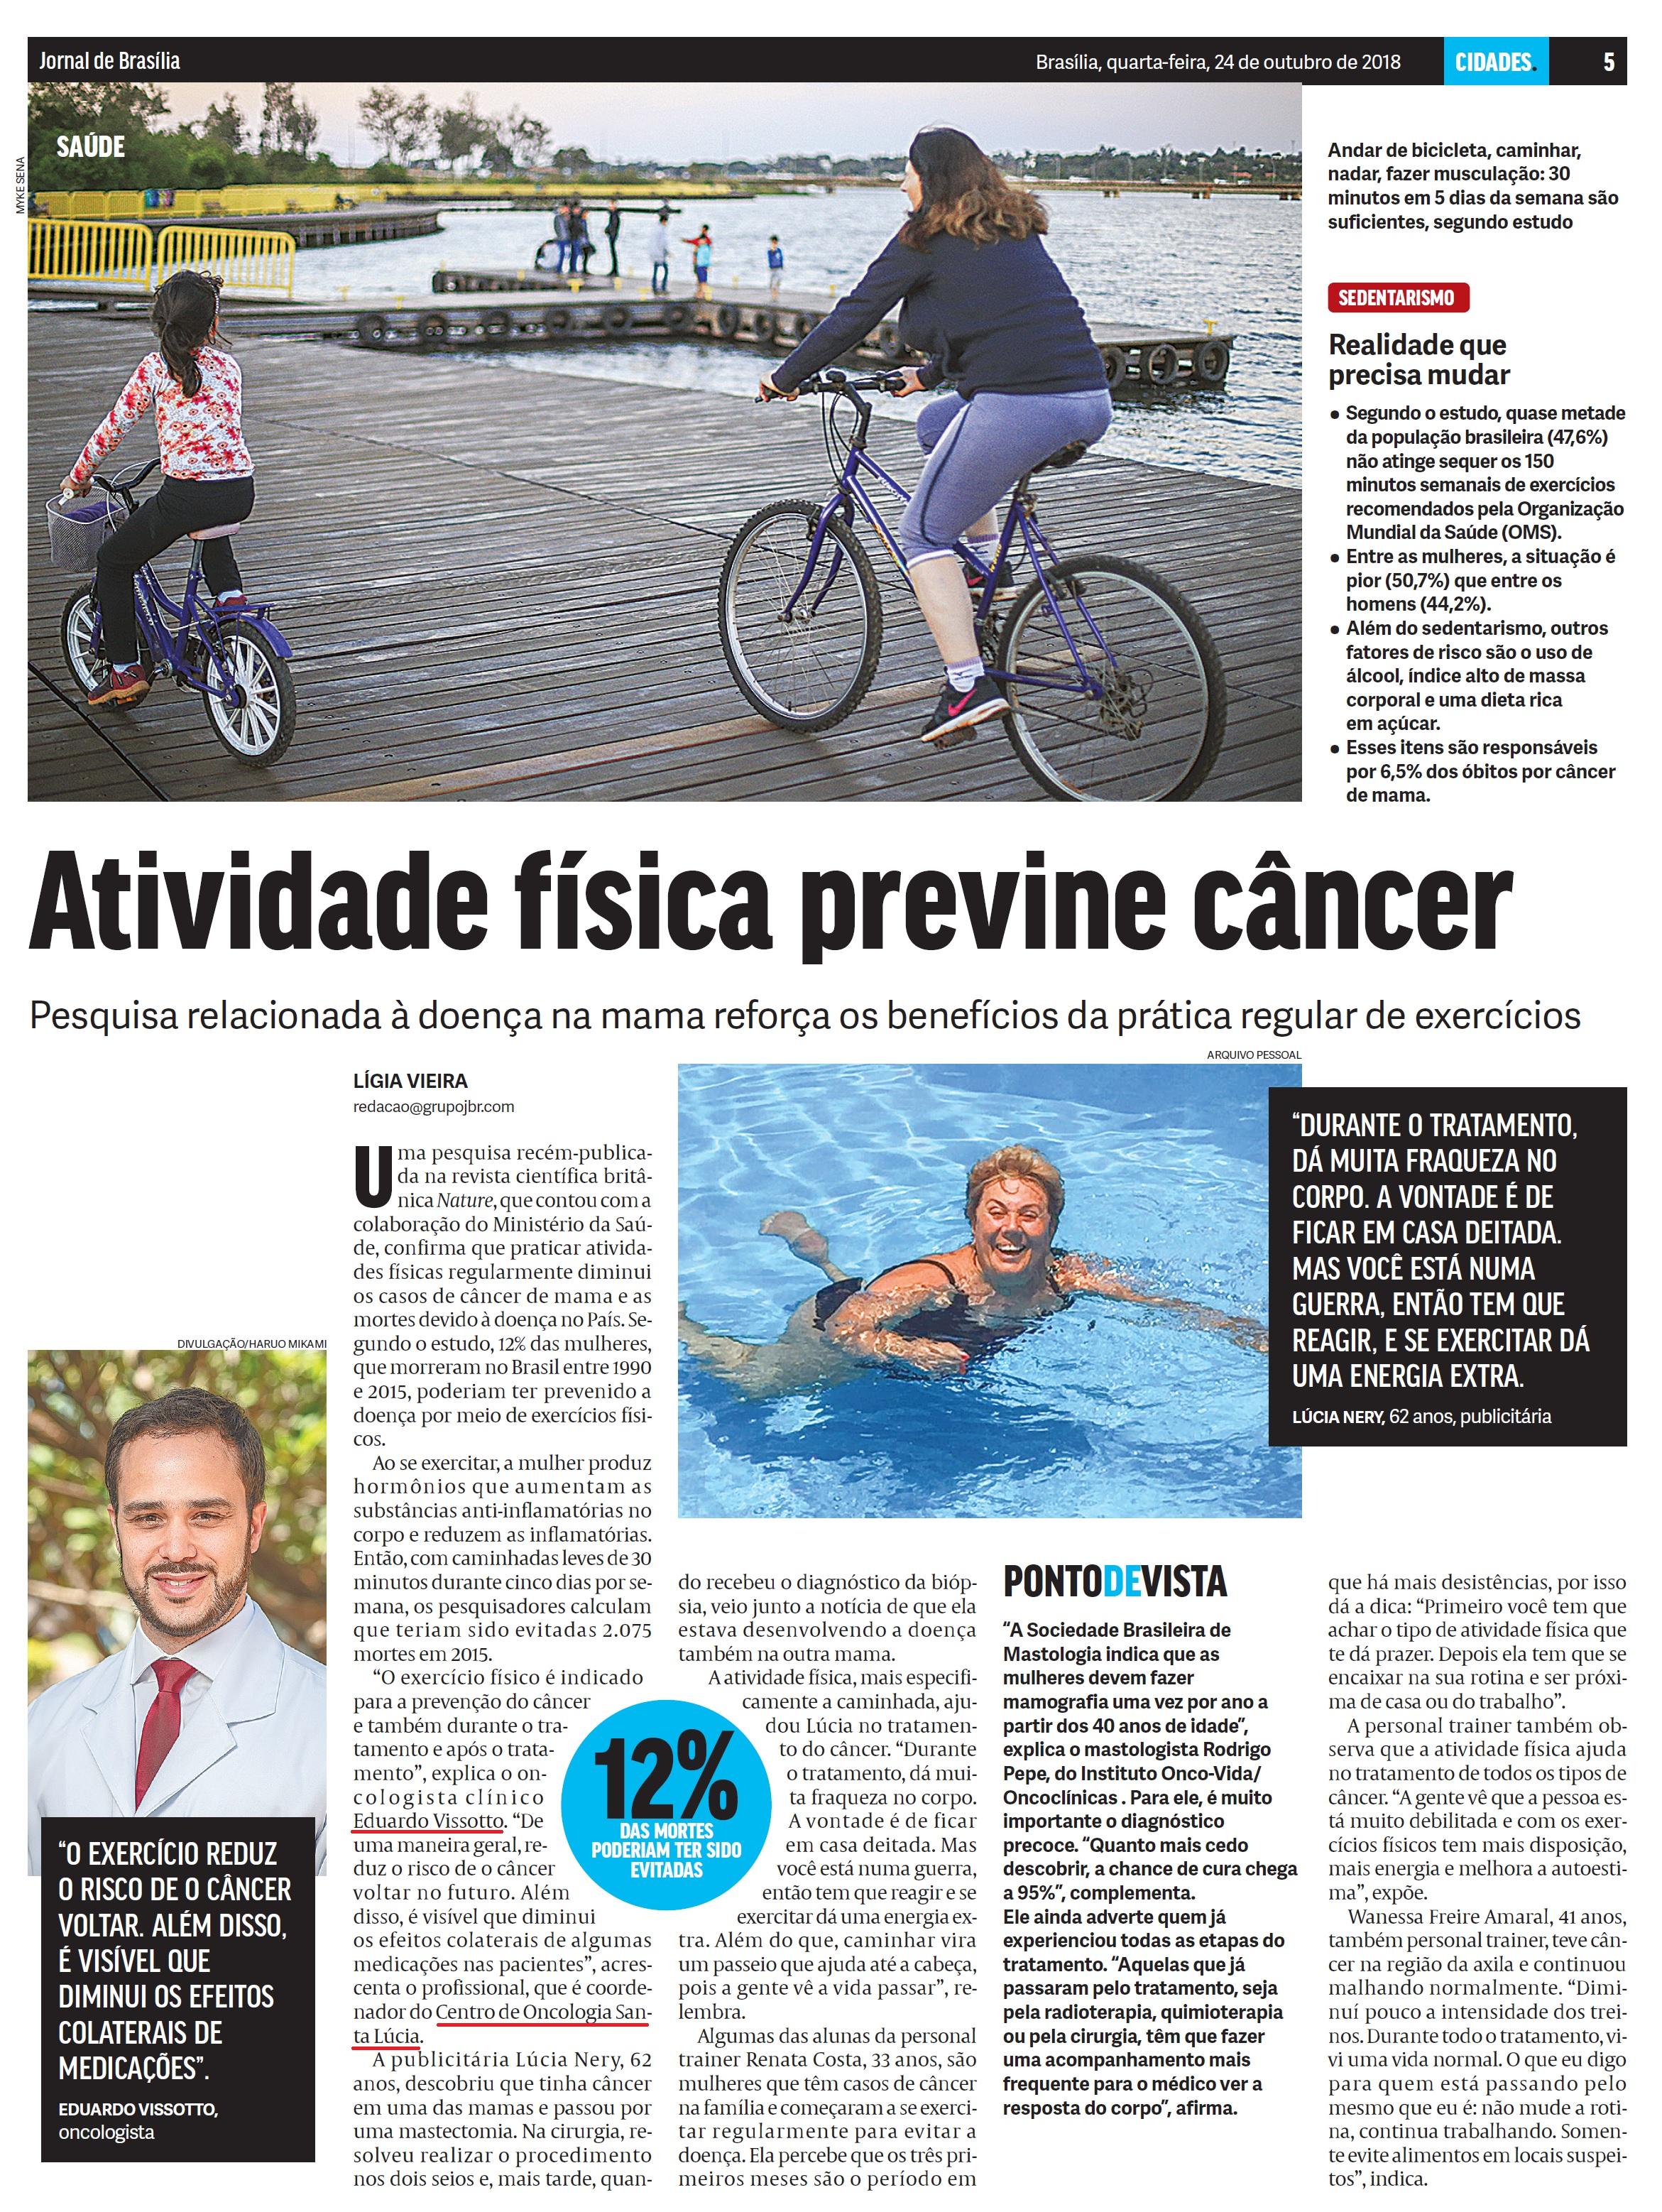 Jornal de Brasília - Dr. Eduardo Vissotto HSLS - 24-10-2018